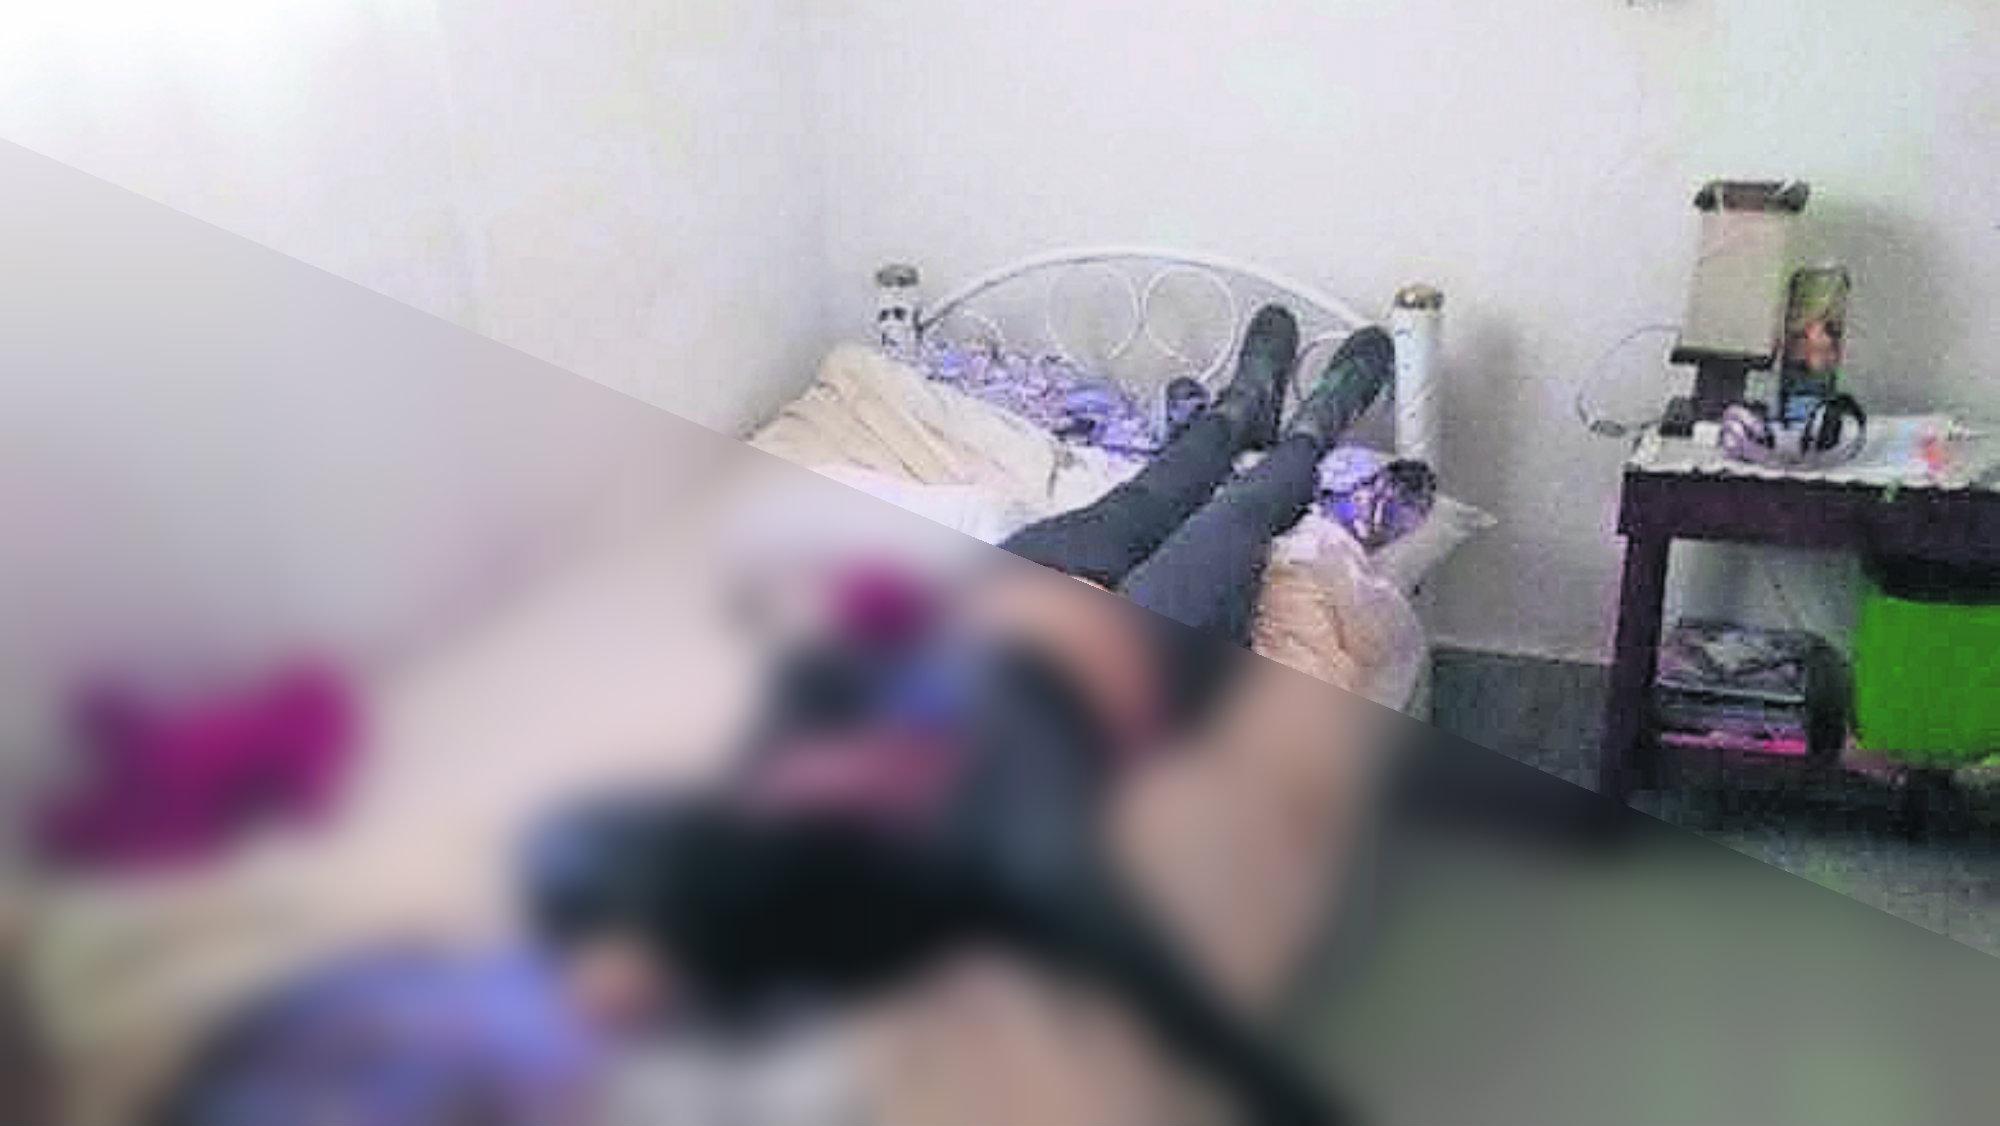 Joven asfixiada apuñalada Violencia en pareja Edomex Nezahualcóyotl